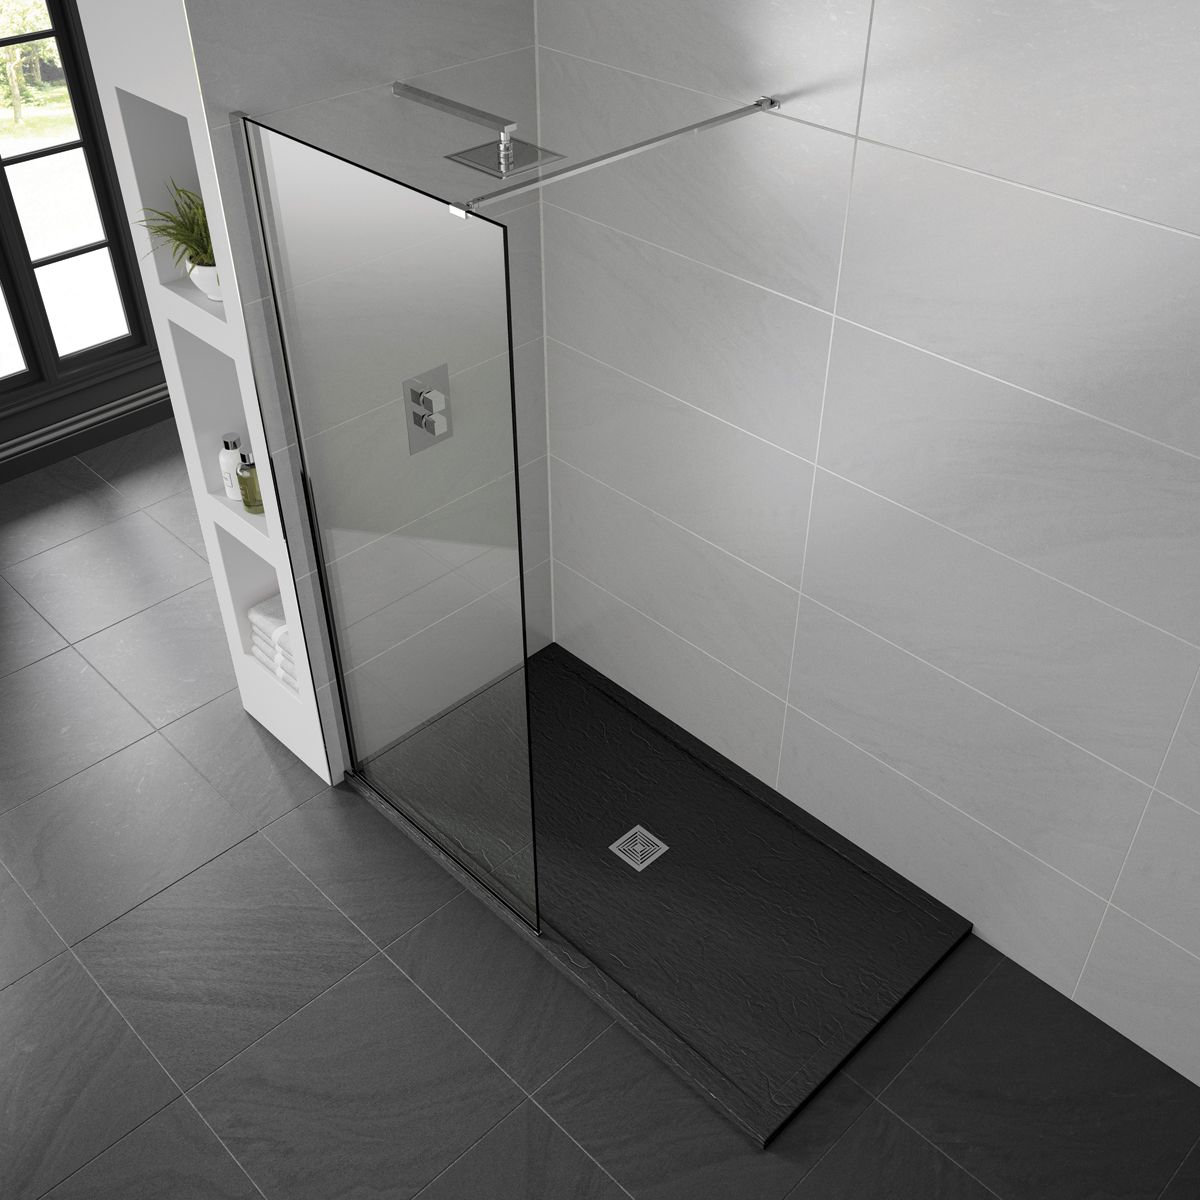 Aquadart Black Slate Shower Tray 1400 x 900 Lifestyle